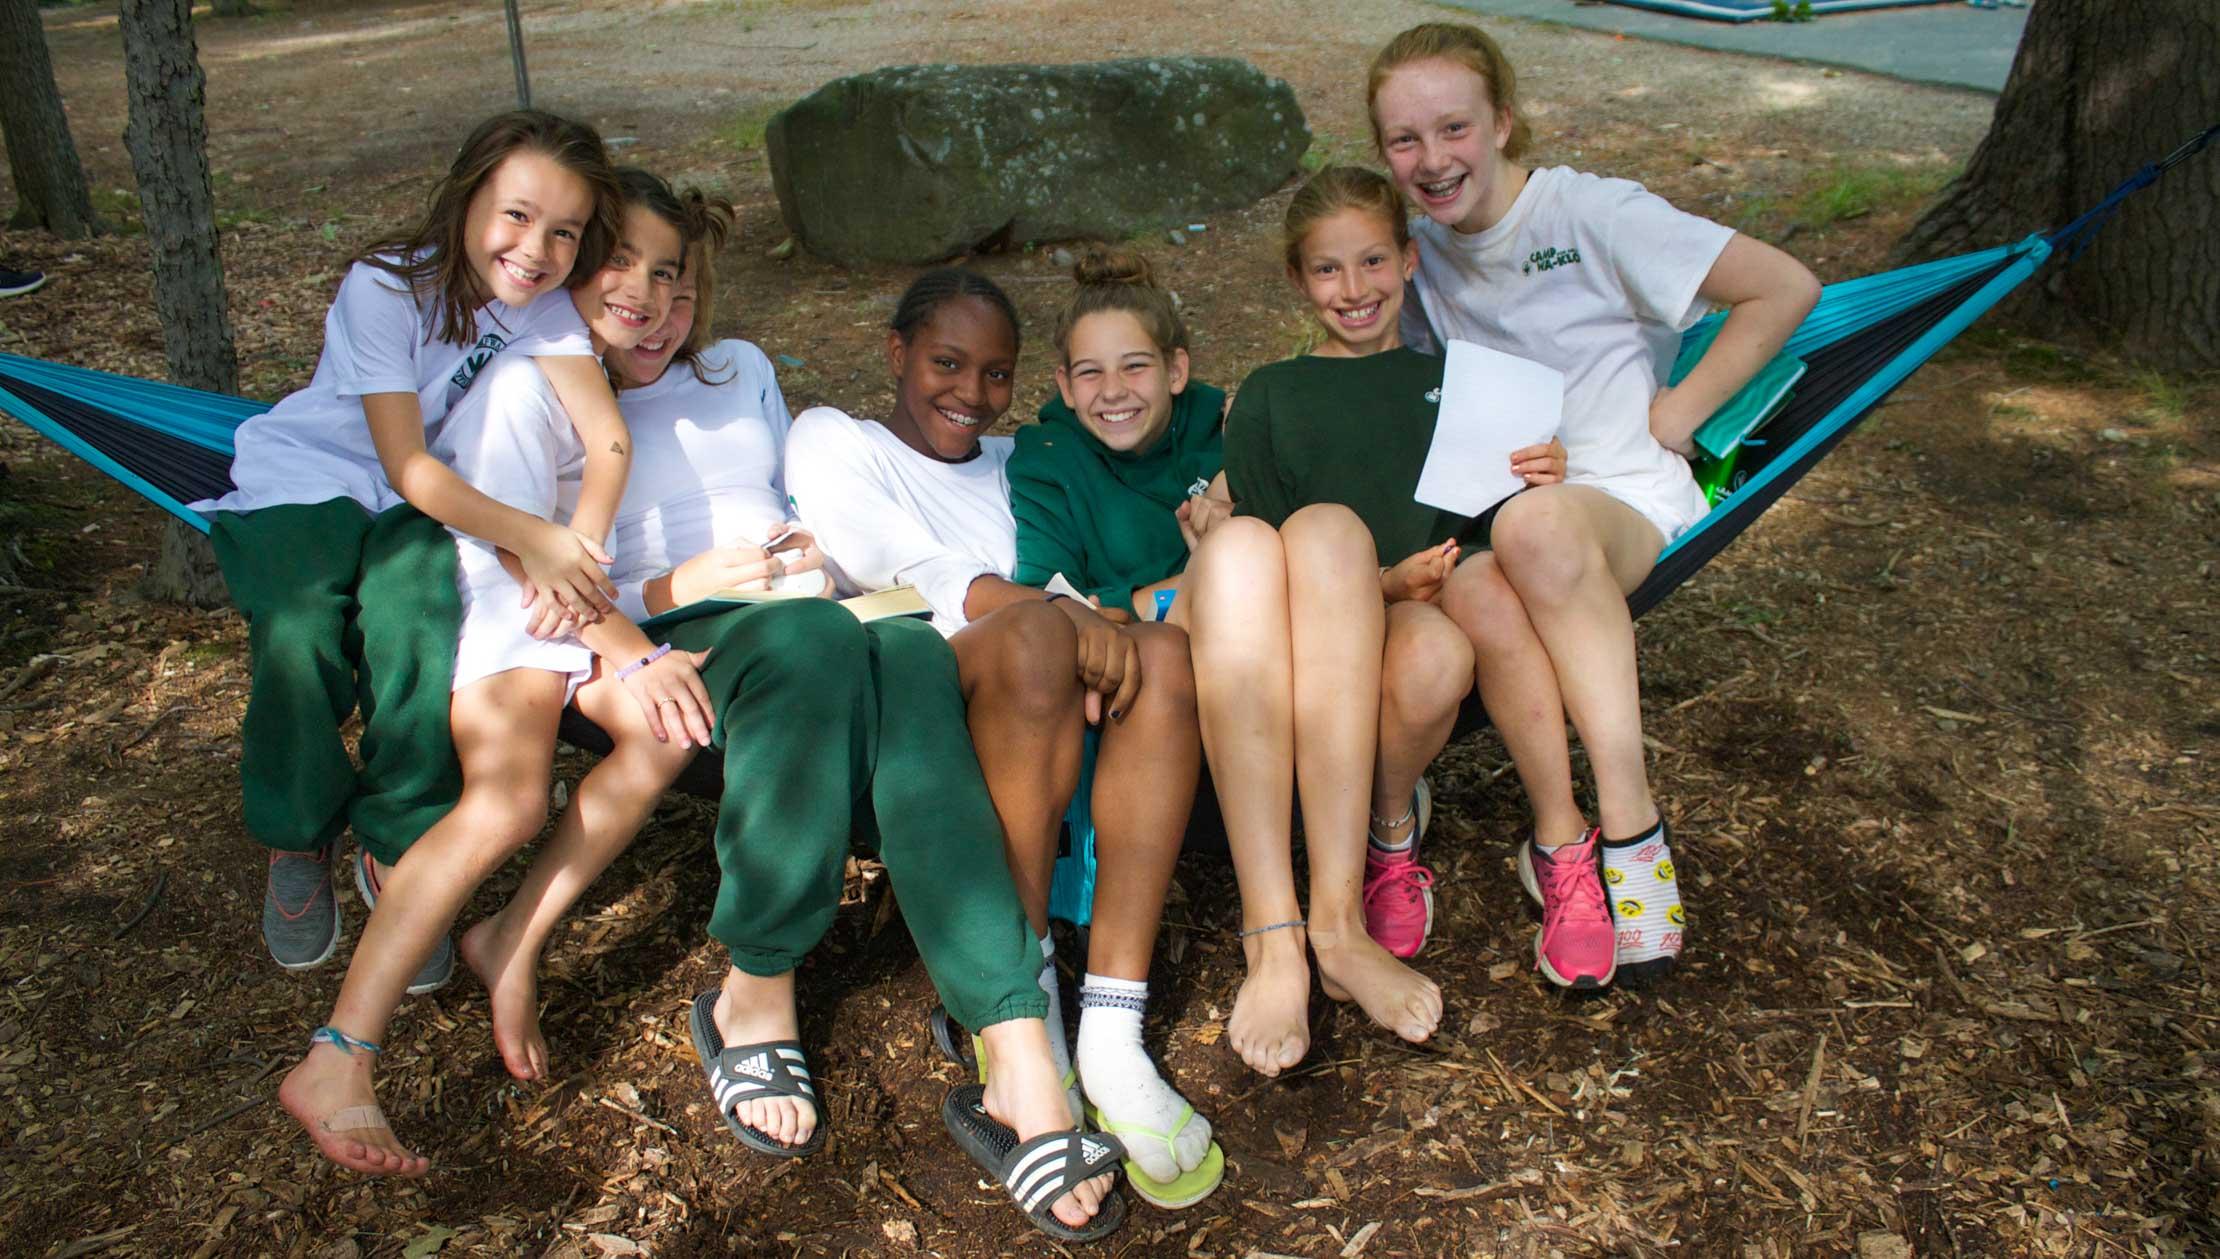 Group of girls in hammock reading